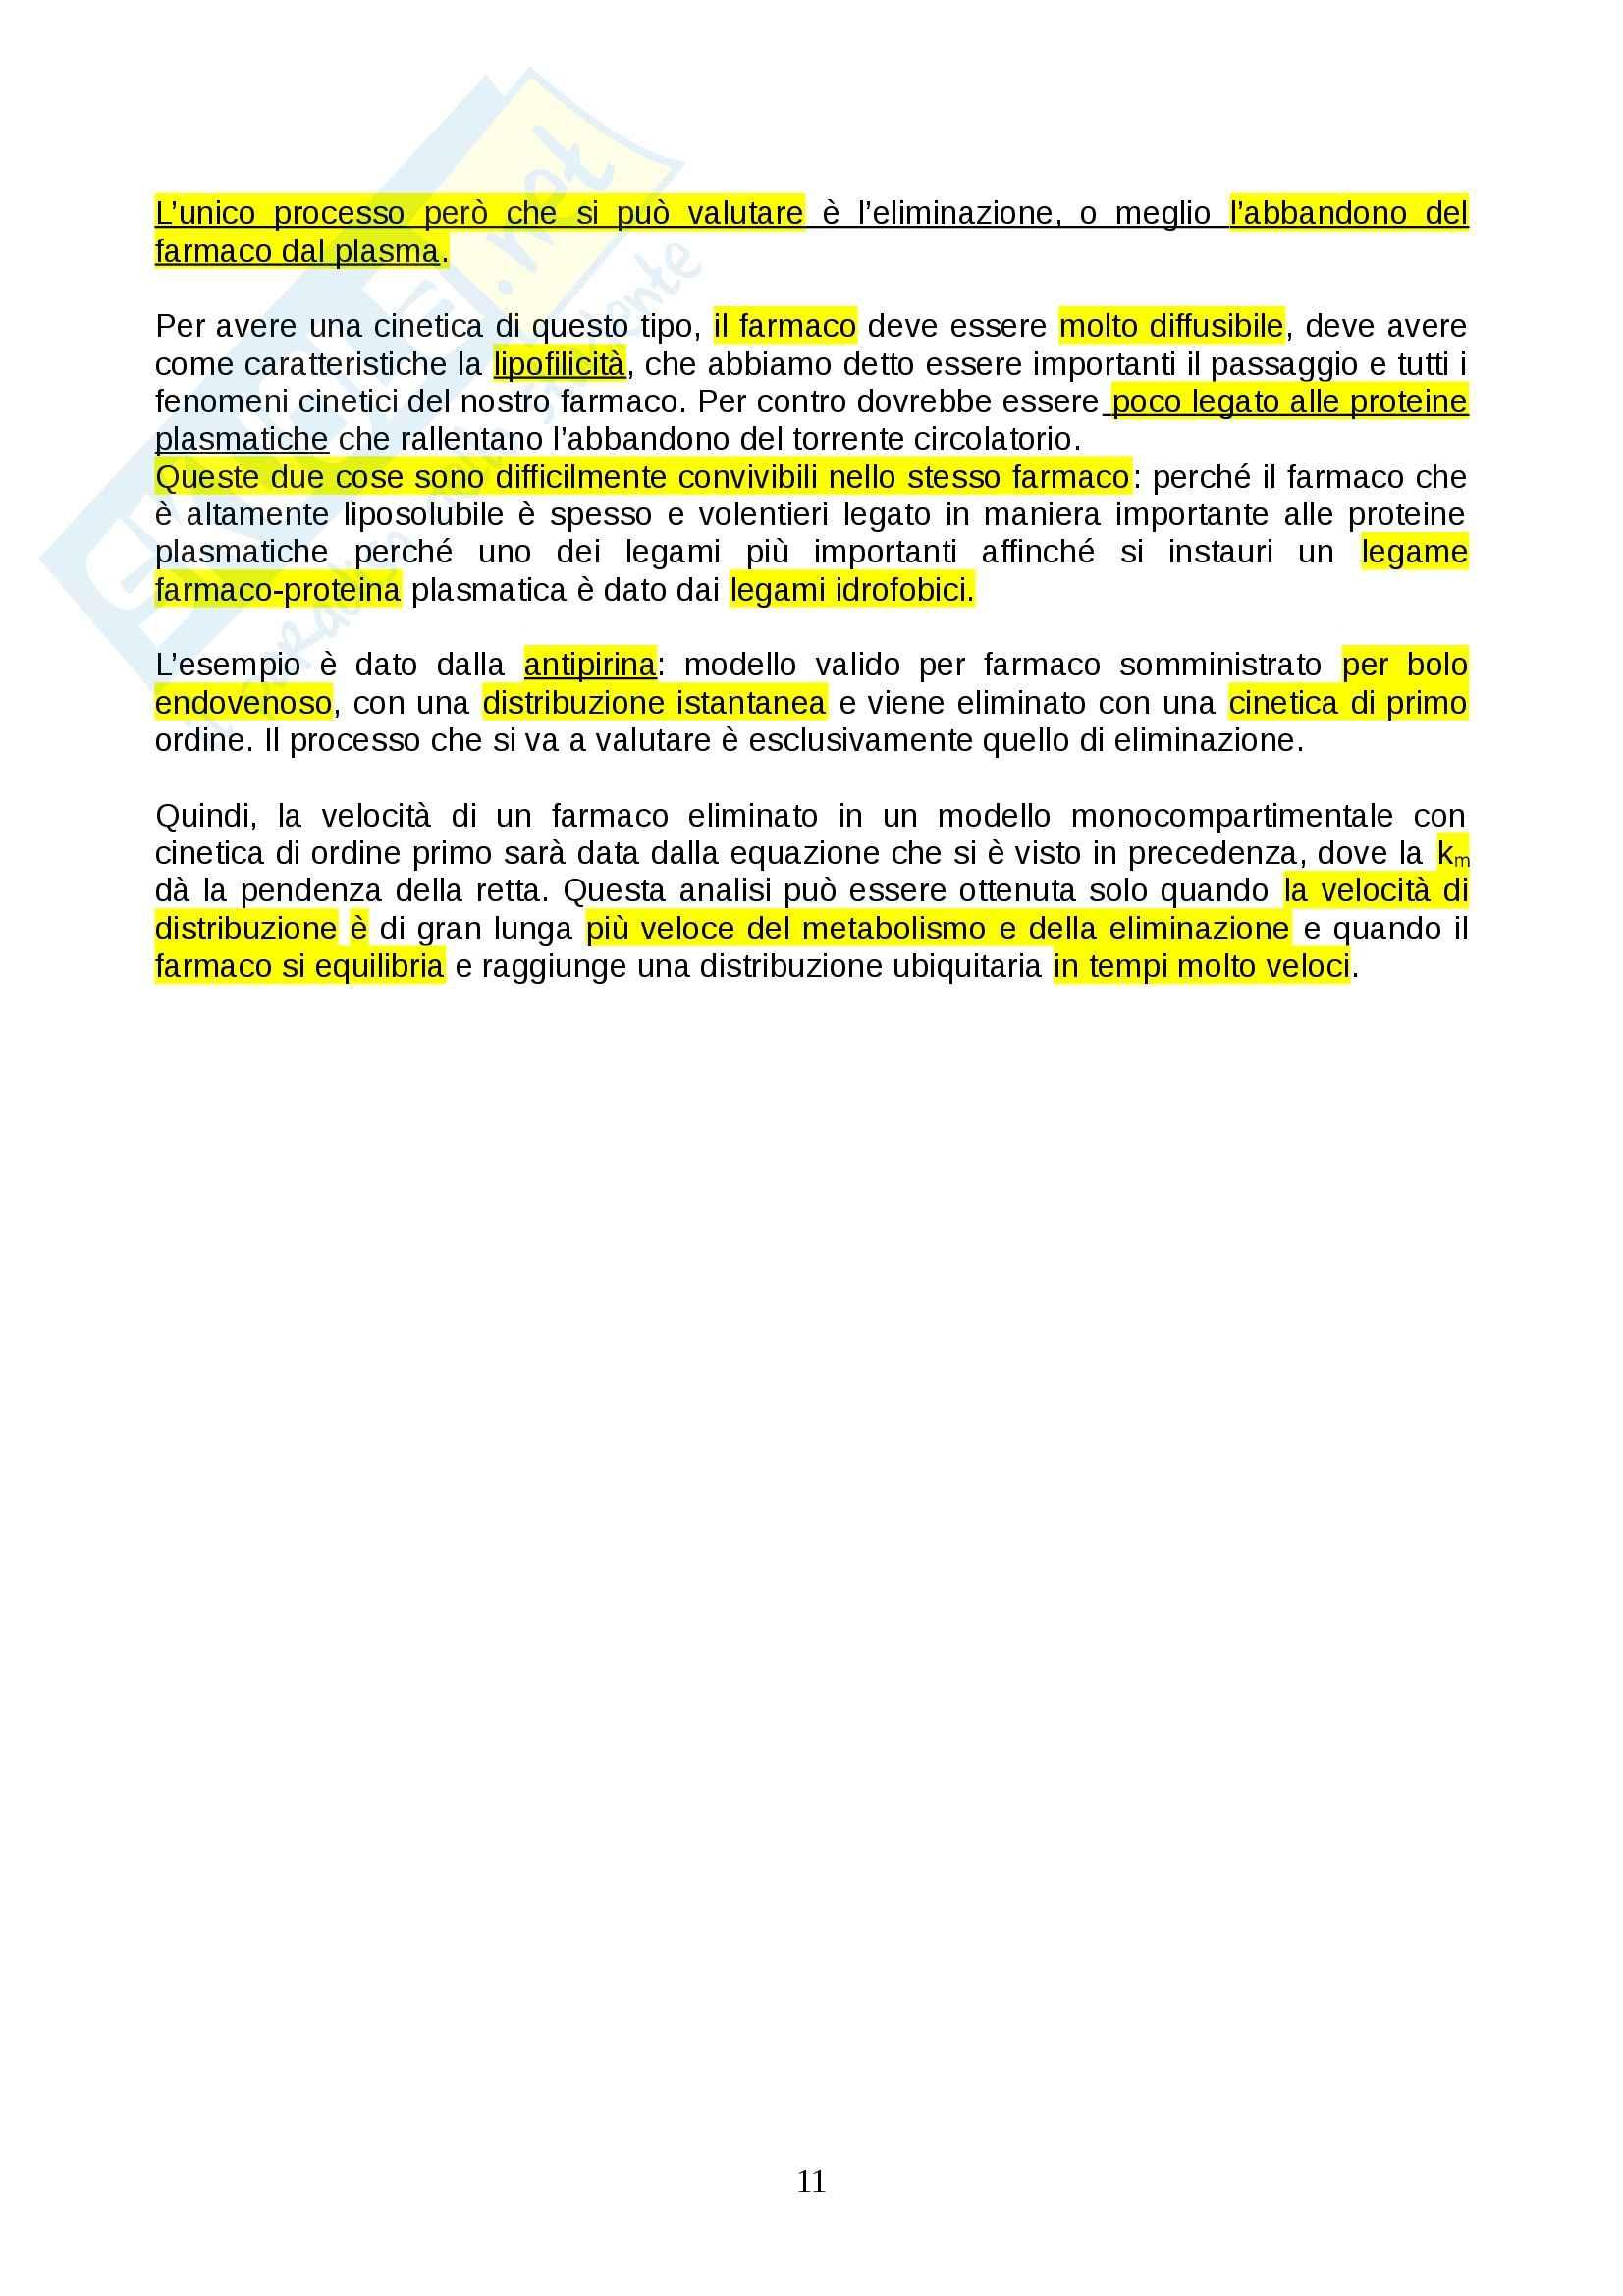 Farmacologia - farmacinetica e dinamica Pag. 11